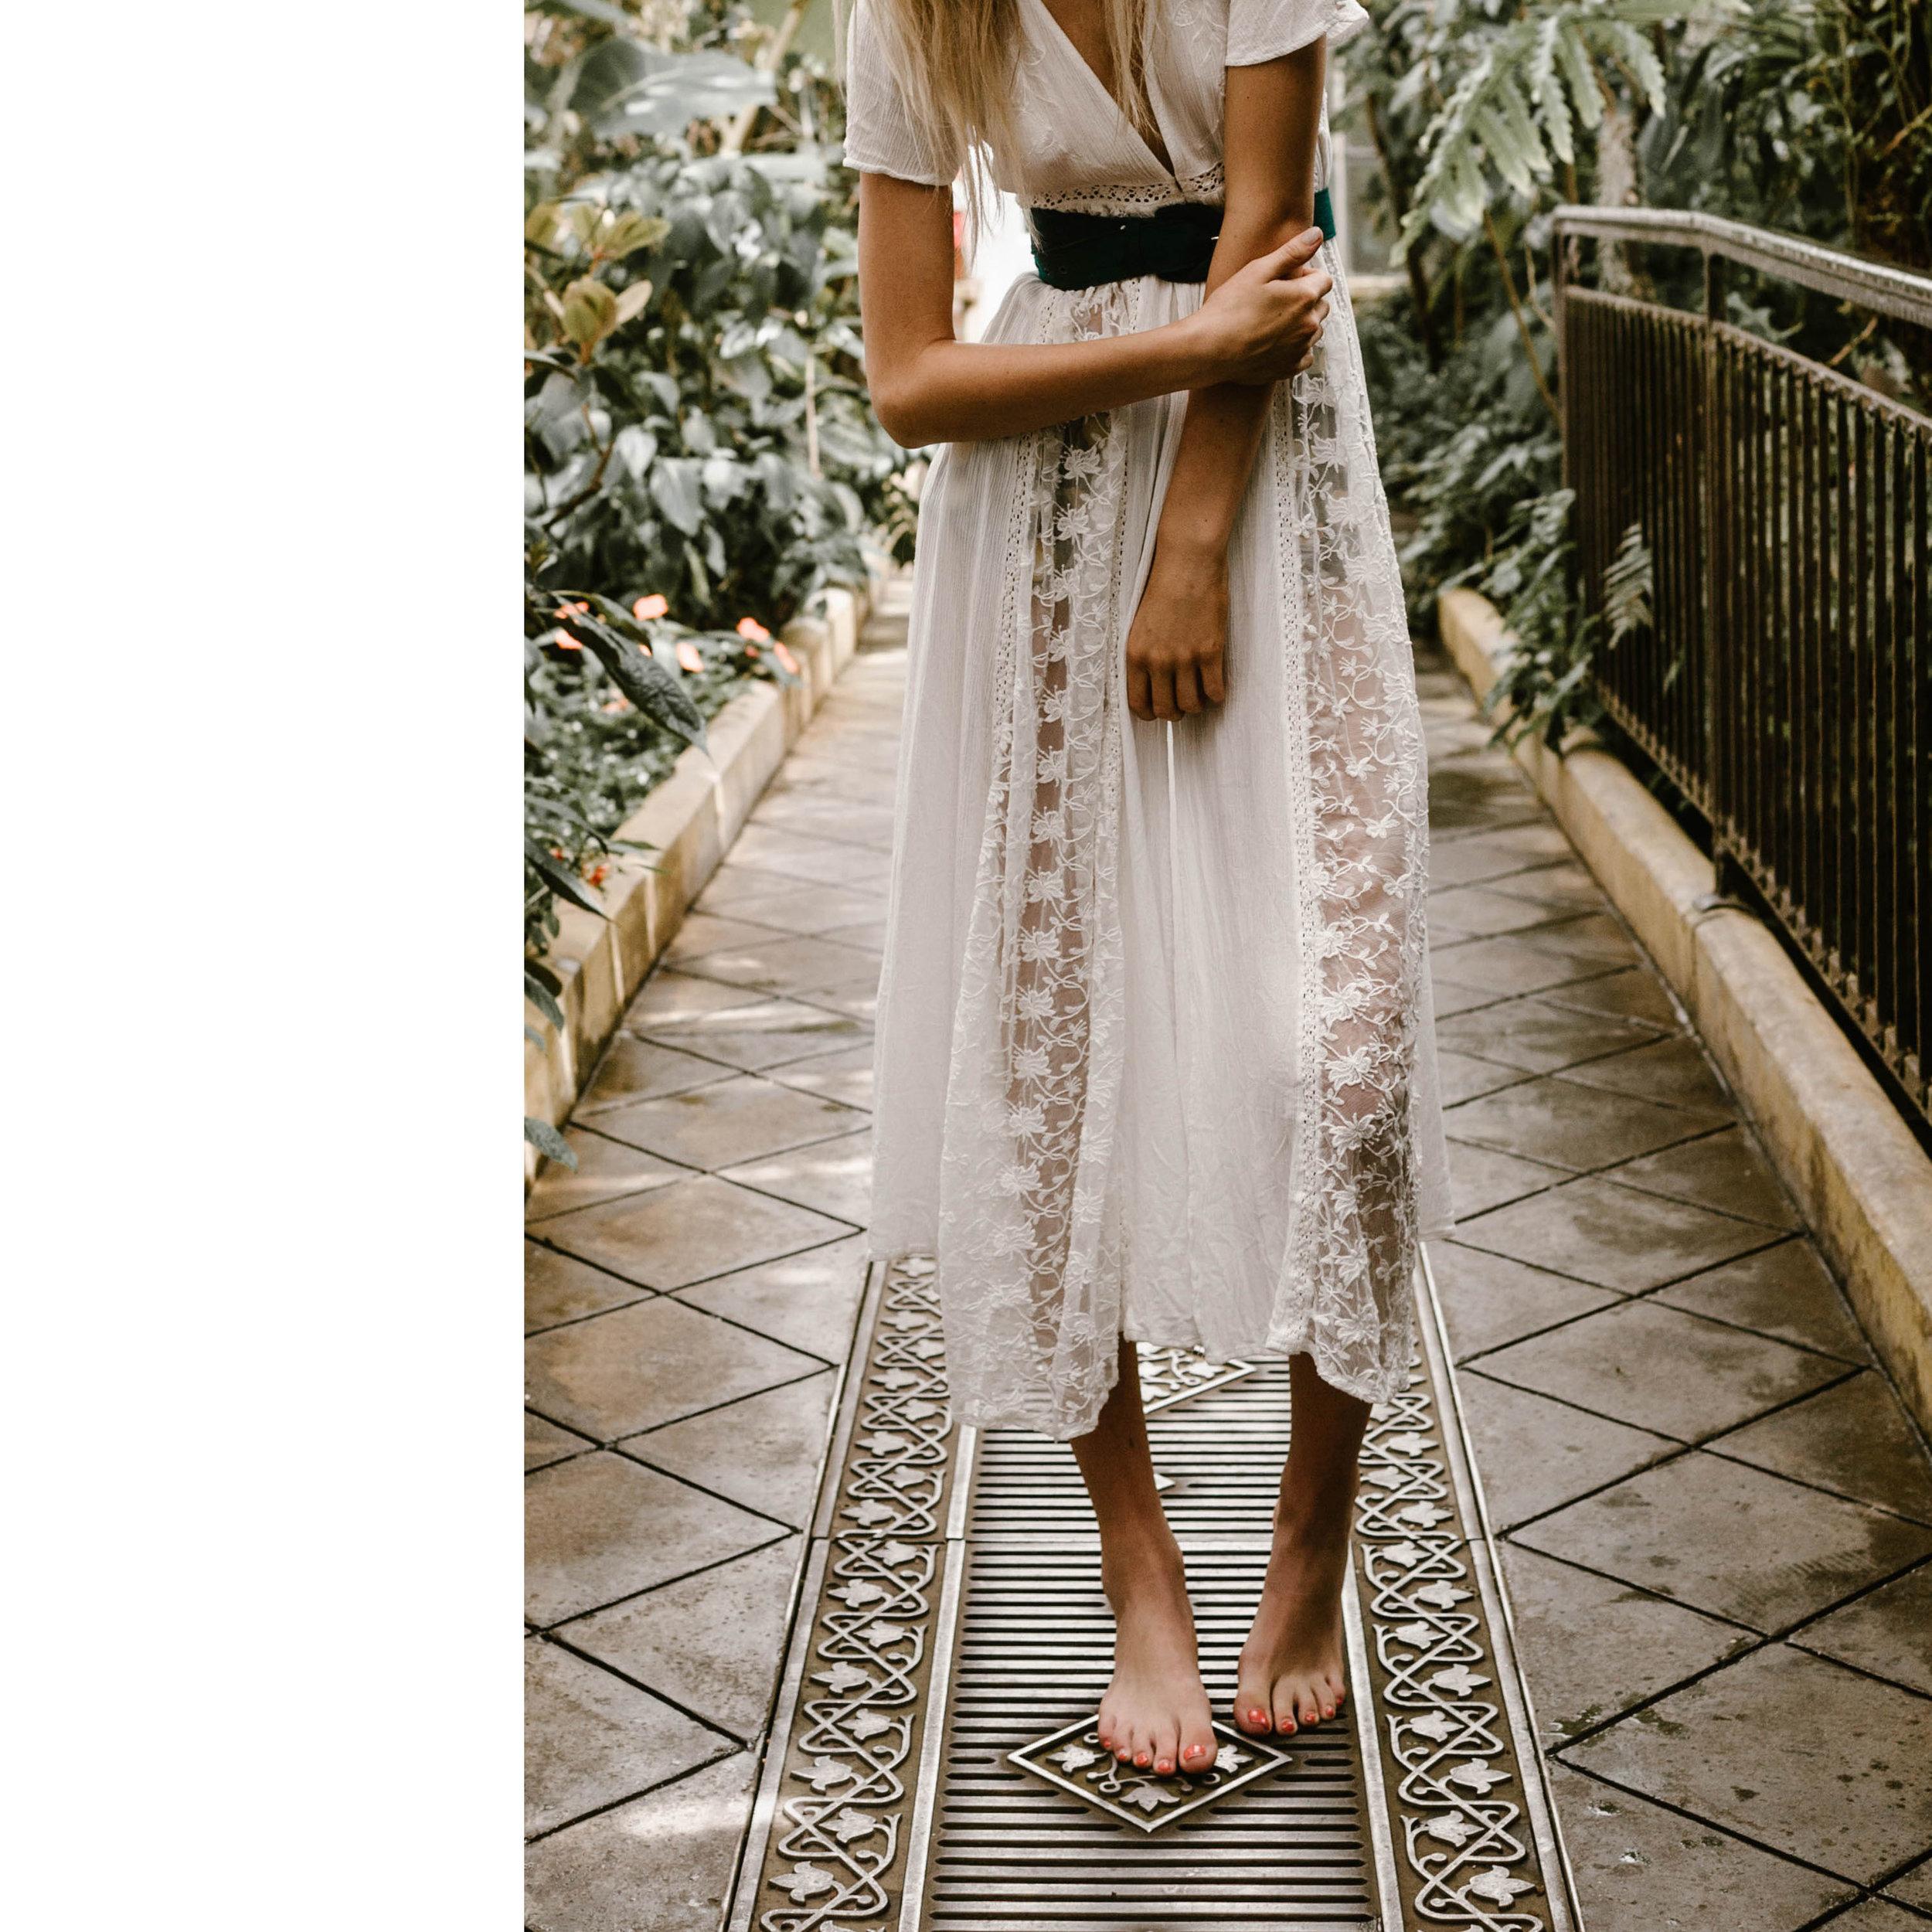 Bloom - Rachel Winters / Niya ModelsValencia Mitchel / stylist Kennedy Jordan / mua